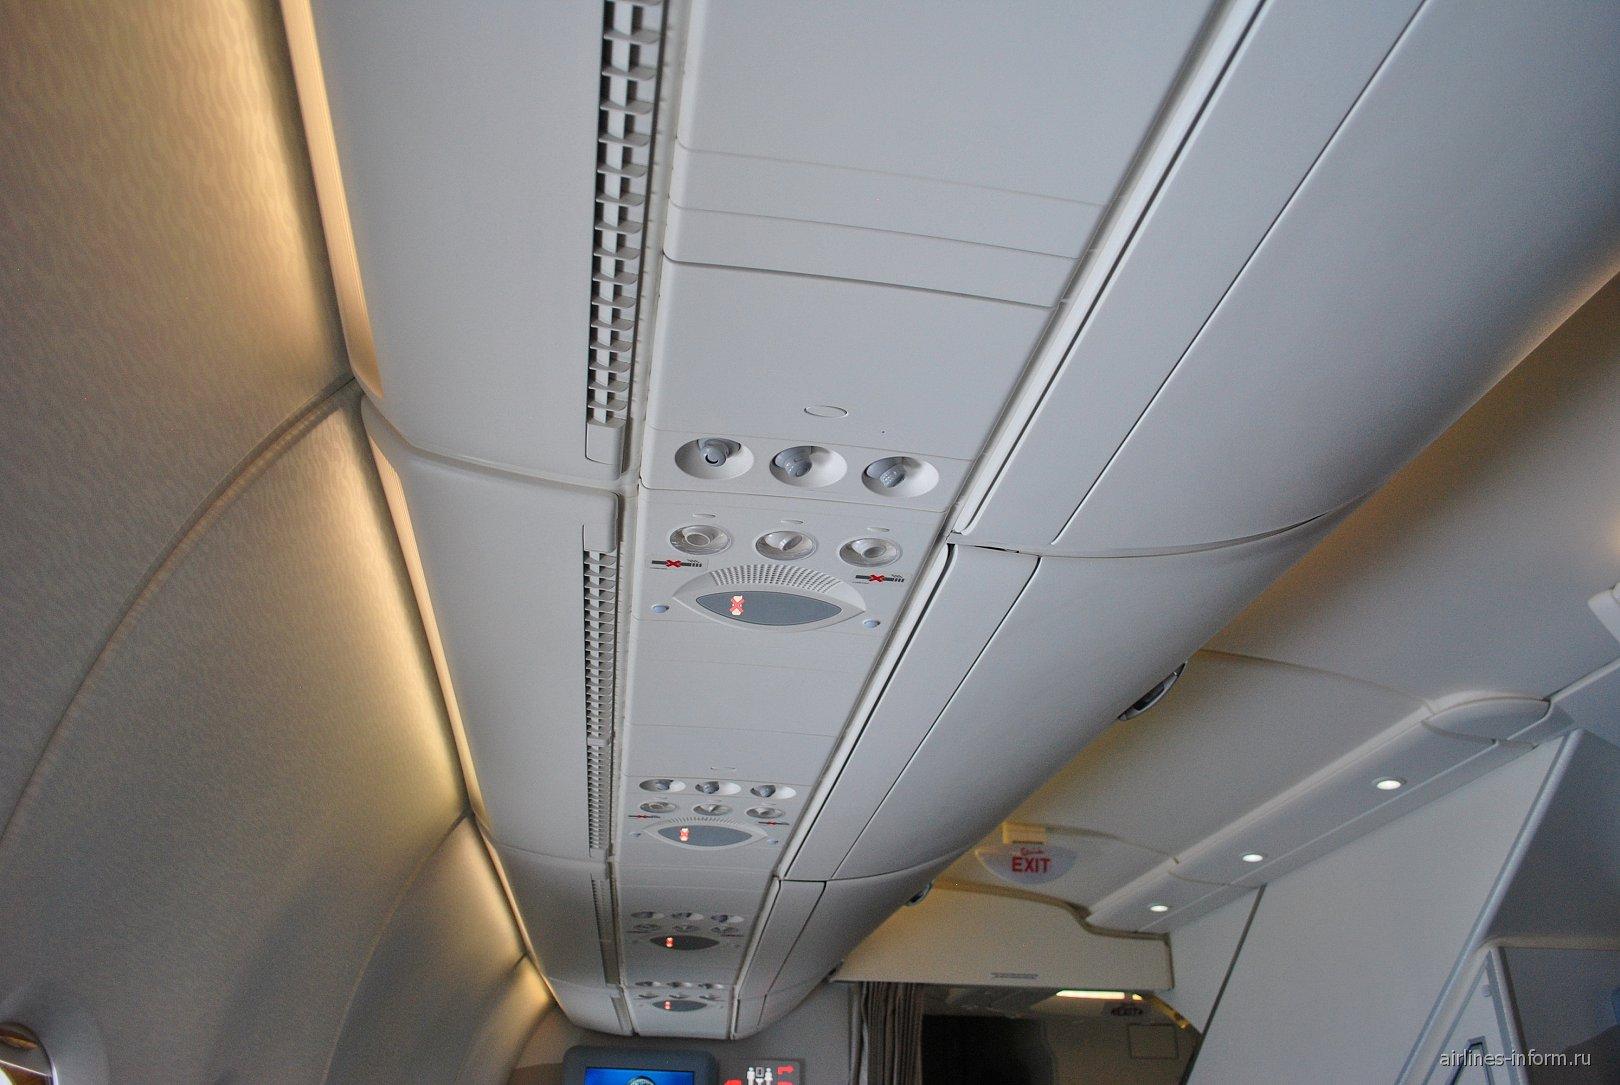 Верхняя панель в салоне самолета Airbus A380